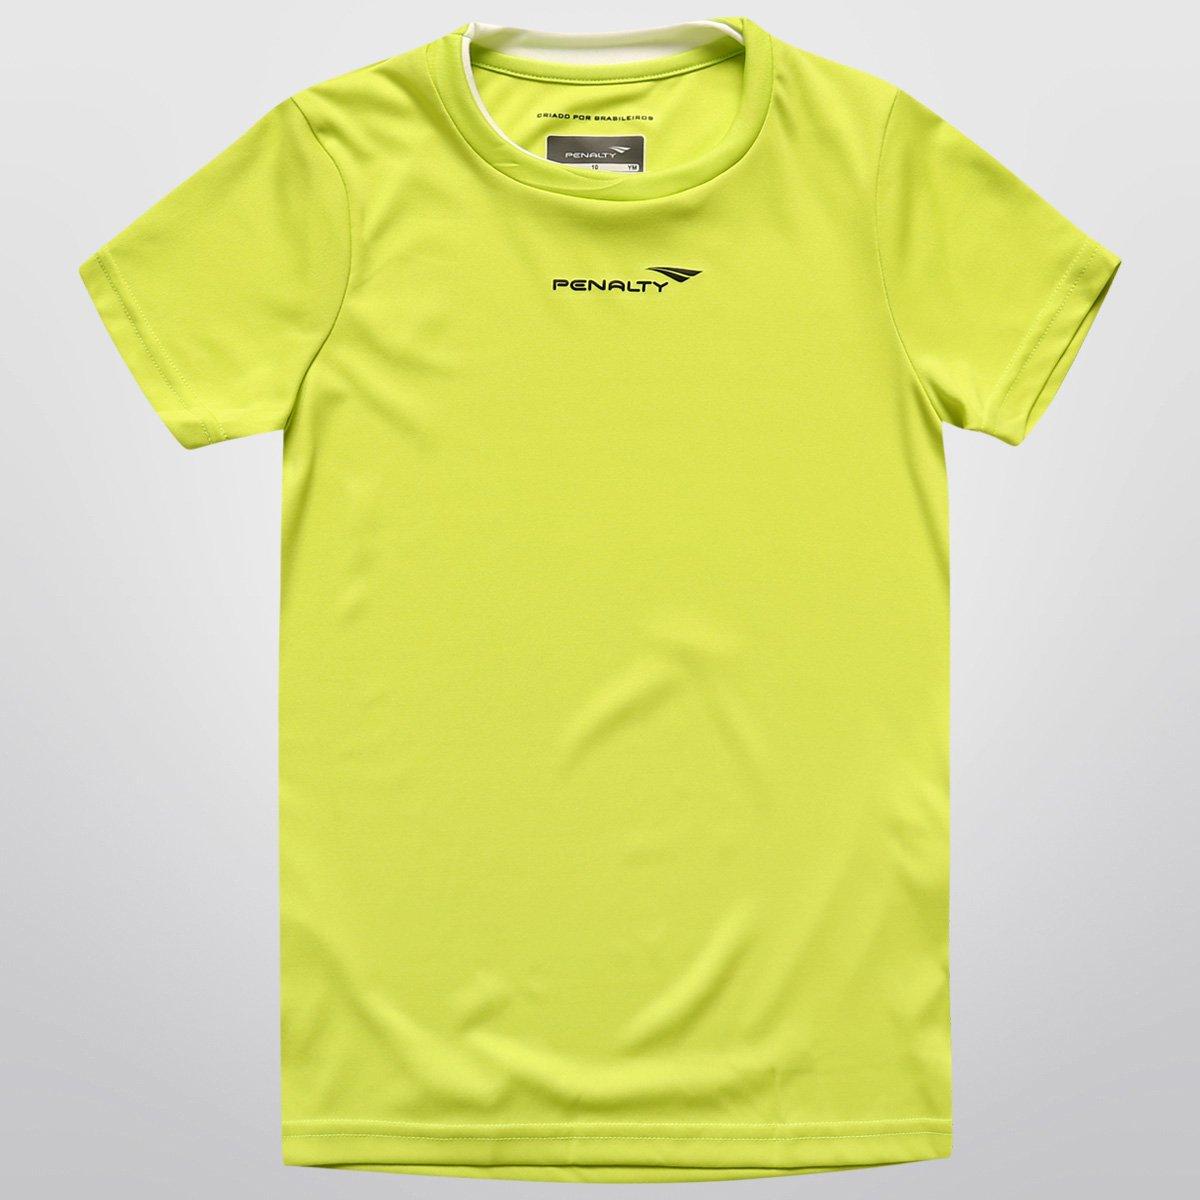 Camisa Penalty Matís Infantil - Compre Agora  6c5776eec9f91